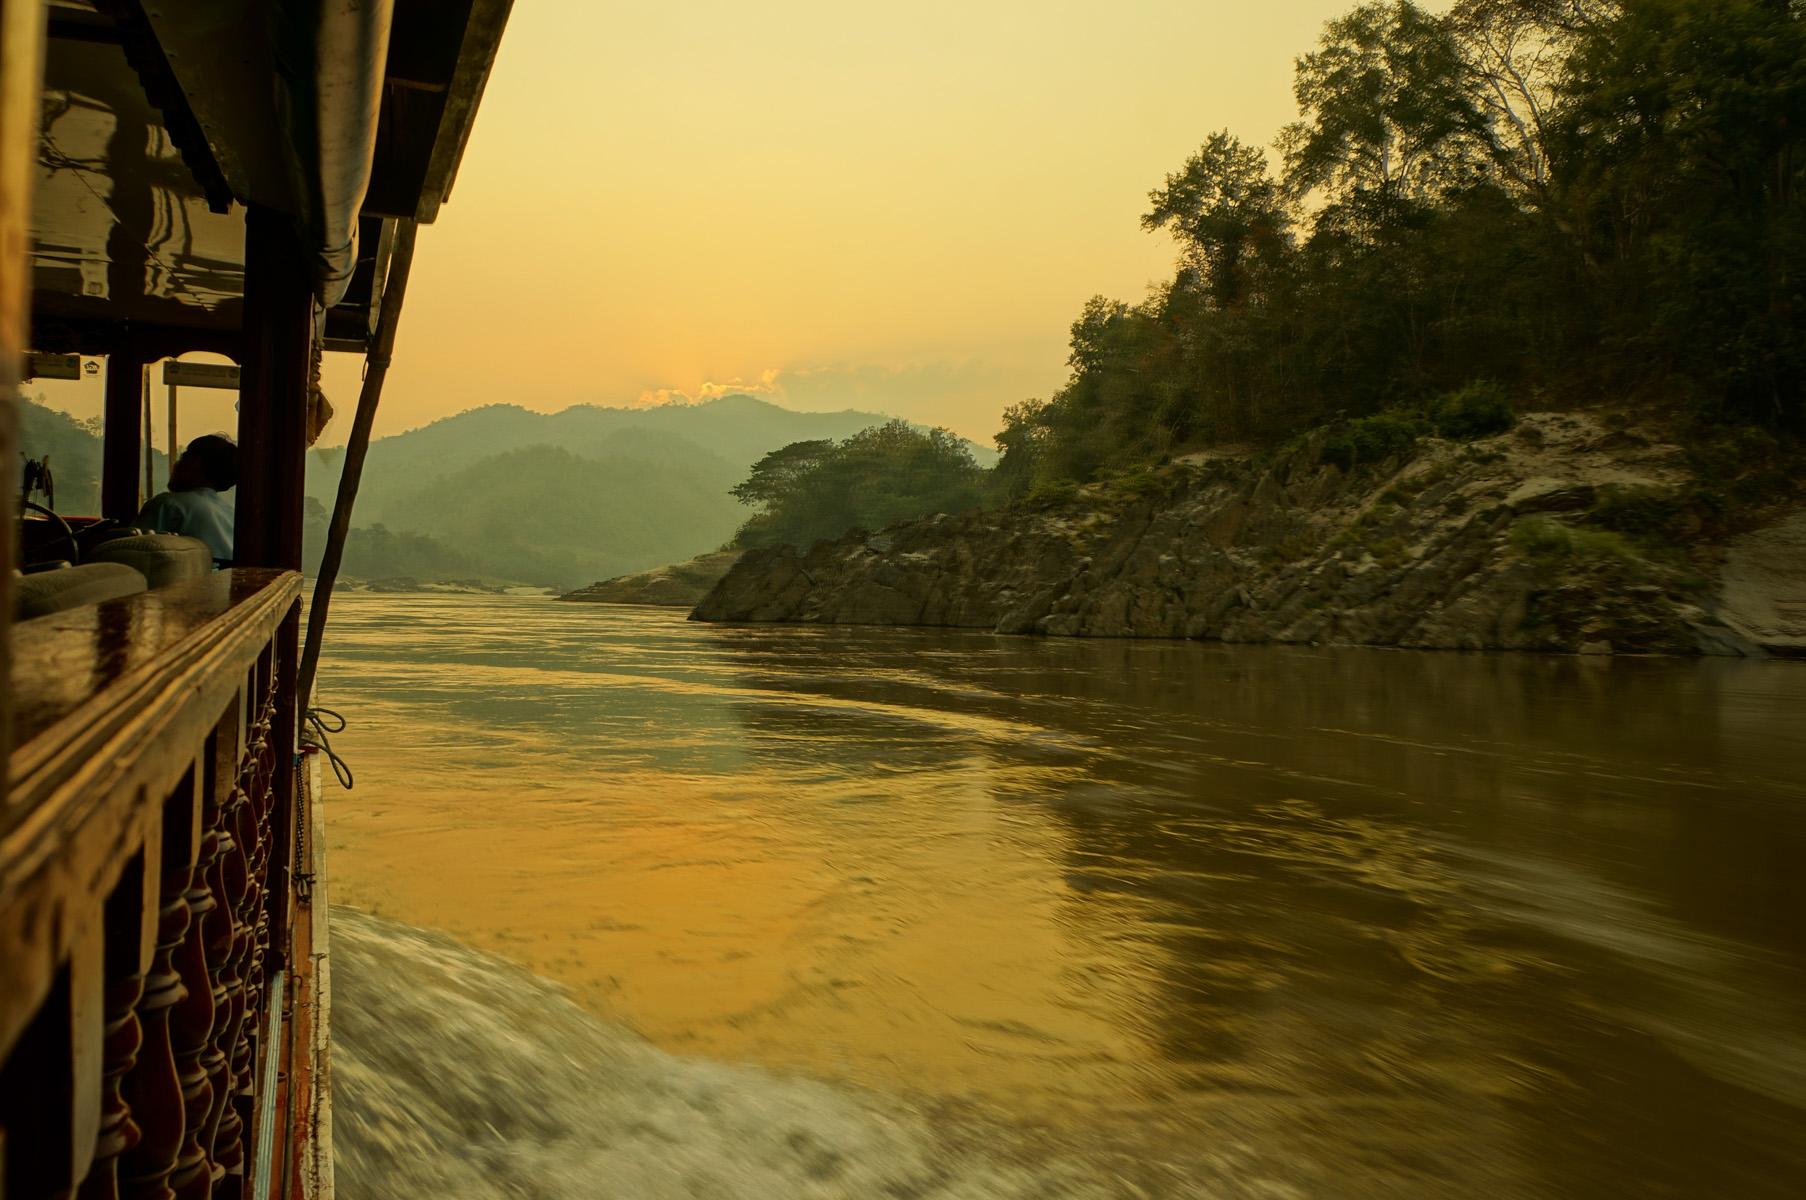 Mekong River Trip-9